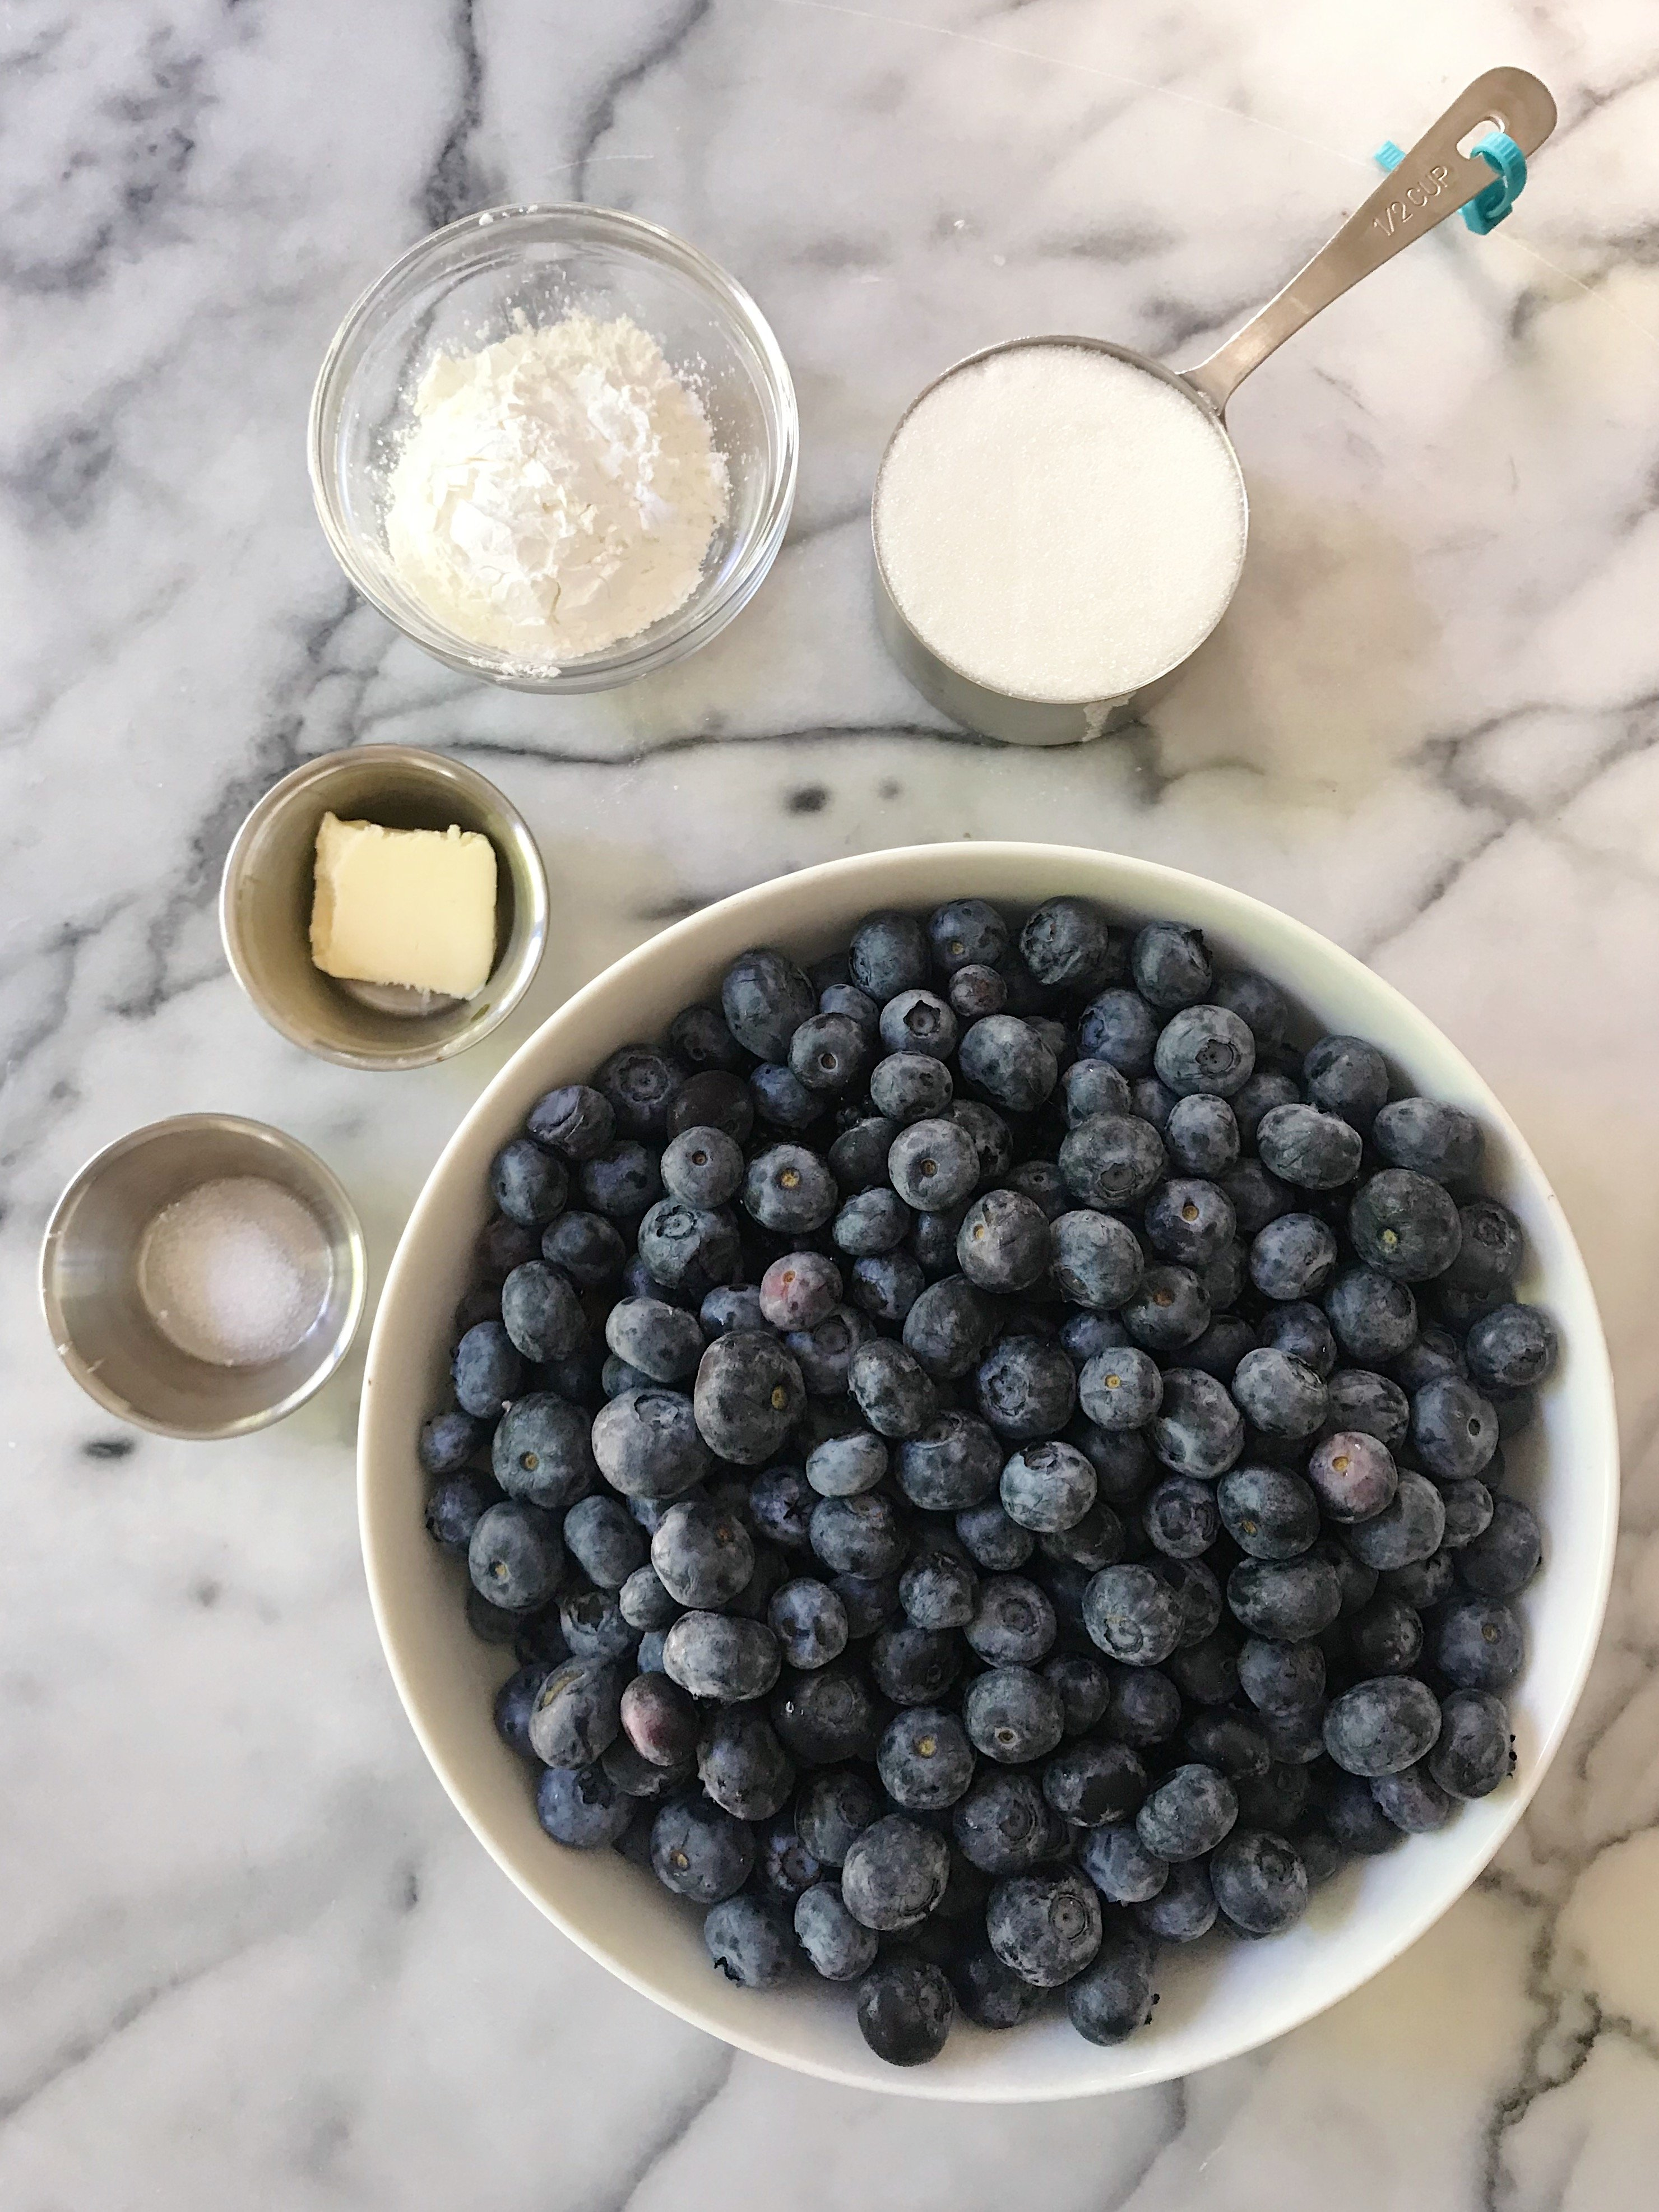 Gluten-Free Blueberry Cobbler #glutenfree #glutenfreerecipes www.healthygffamily.com